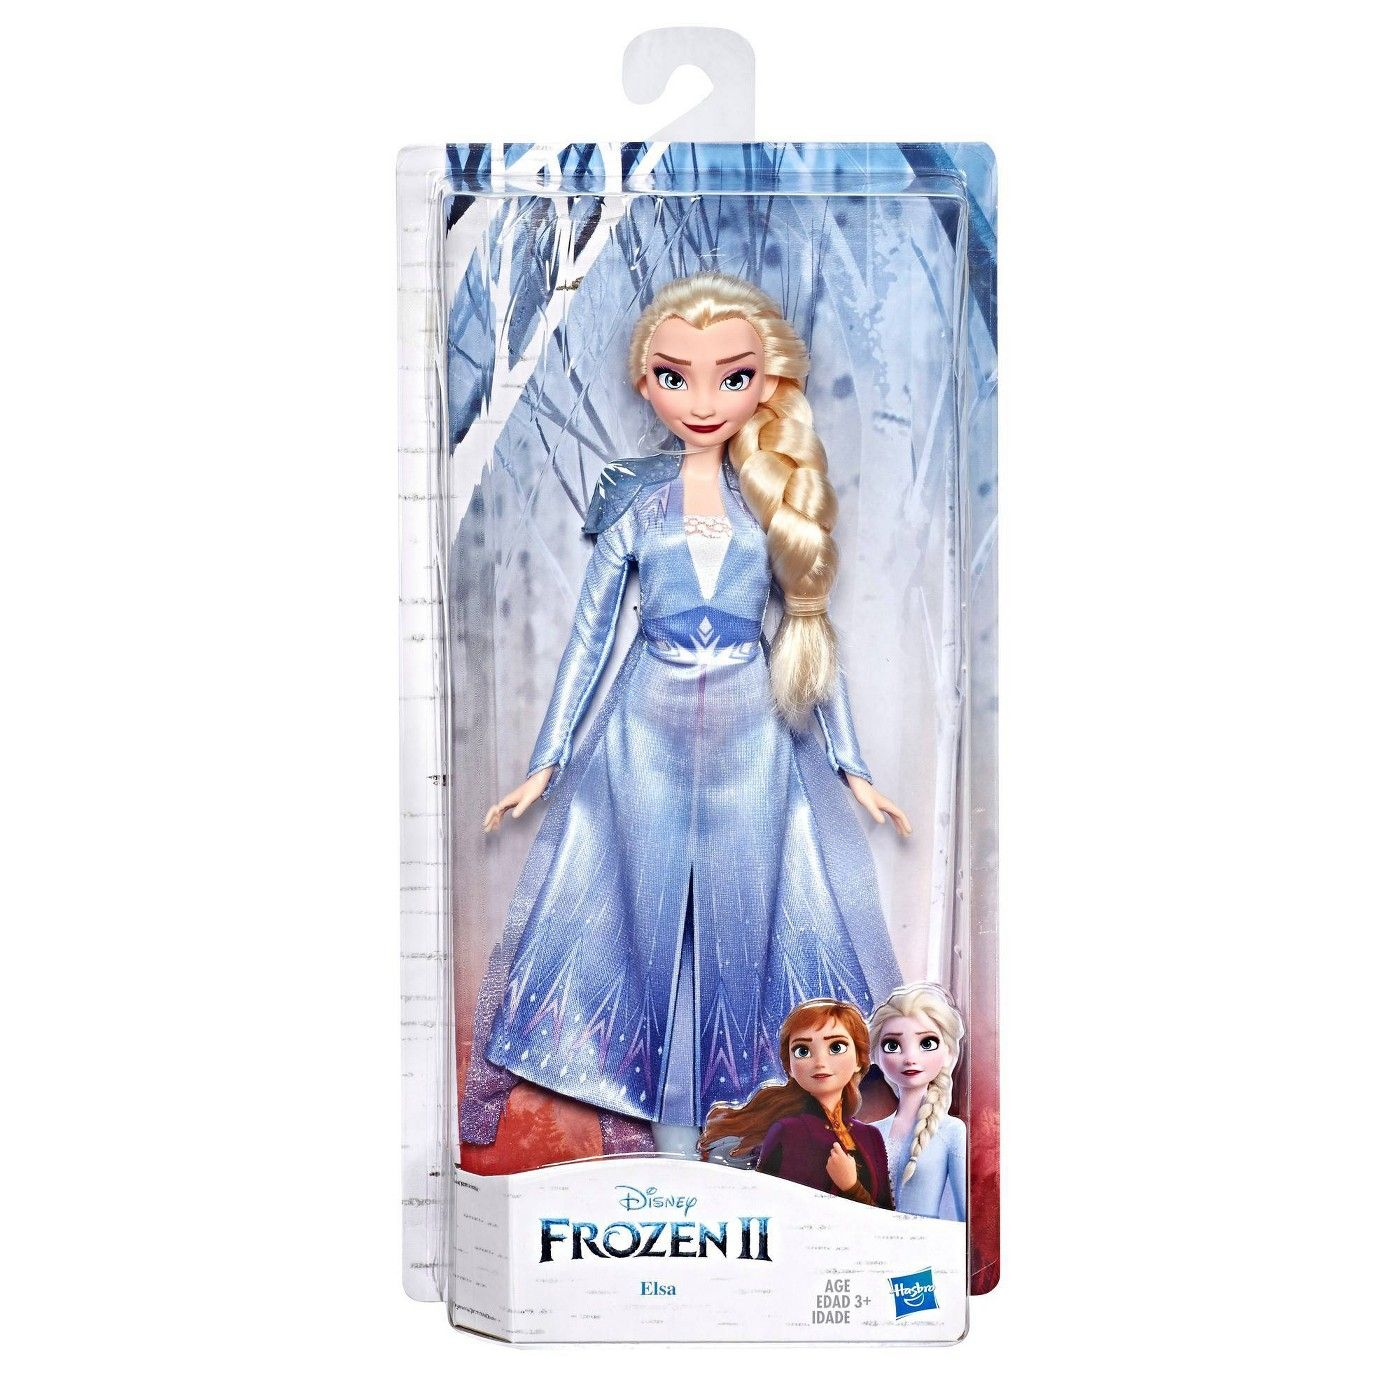 Disney Frozen 2 Elsa Fashion Doll With Blue Ombre Outfit In 2020 Disney Frozen Disney Frozen Dolls Disney Frozen Elsa